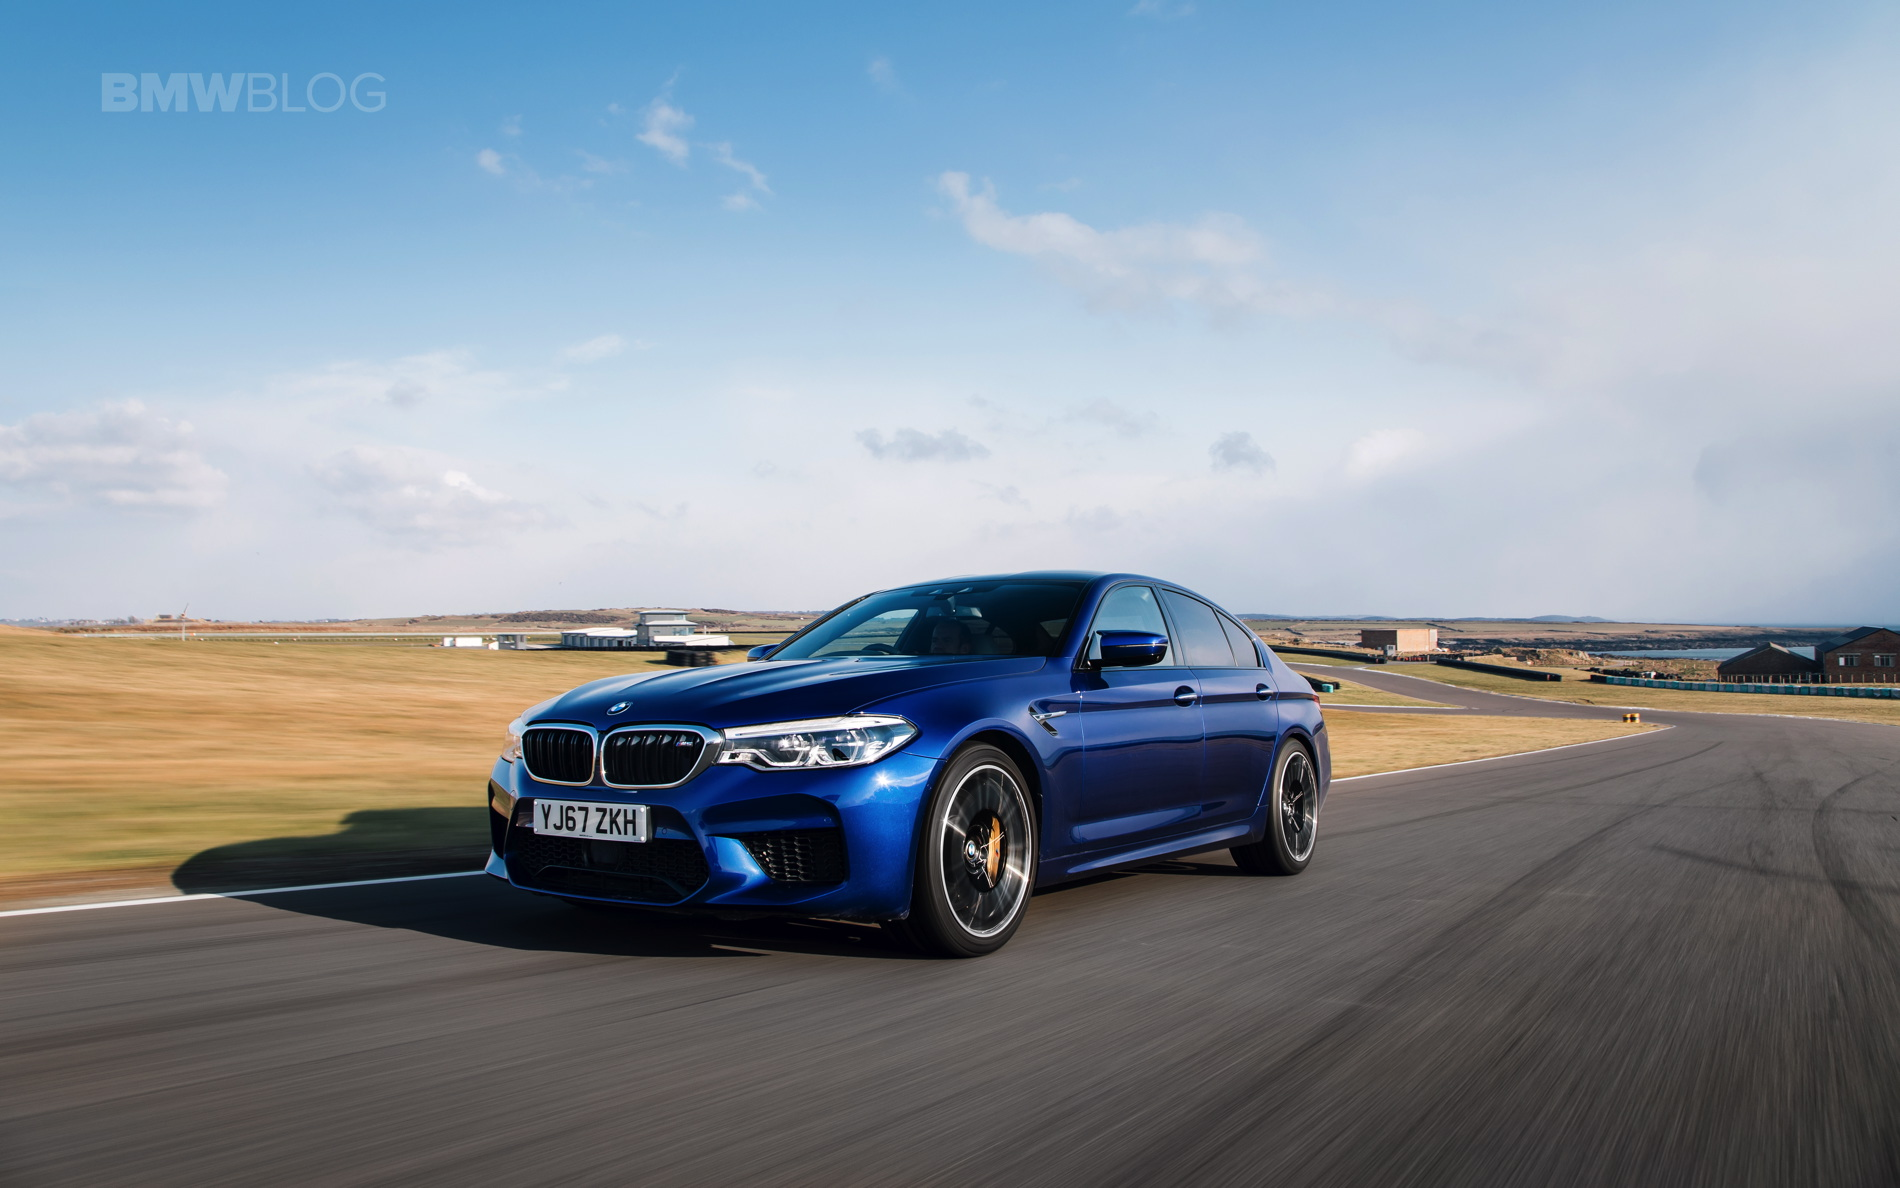 2018 BMW M5 Saloon UK 57